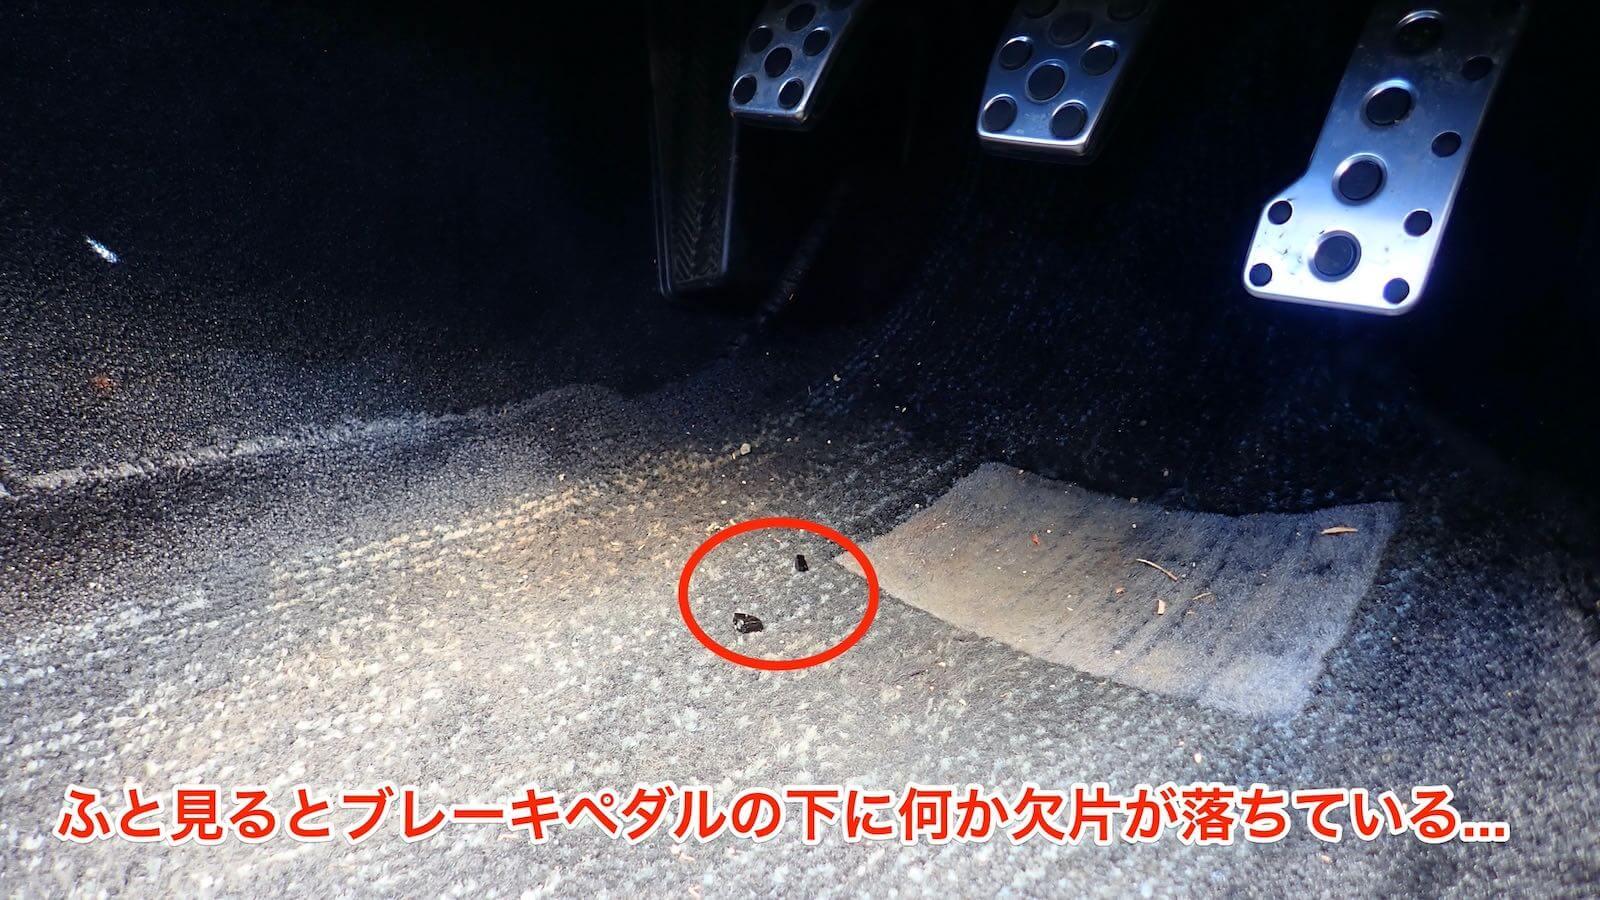 Debris underneath the MR2 brake pedal